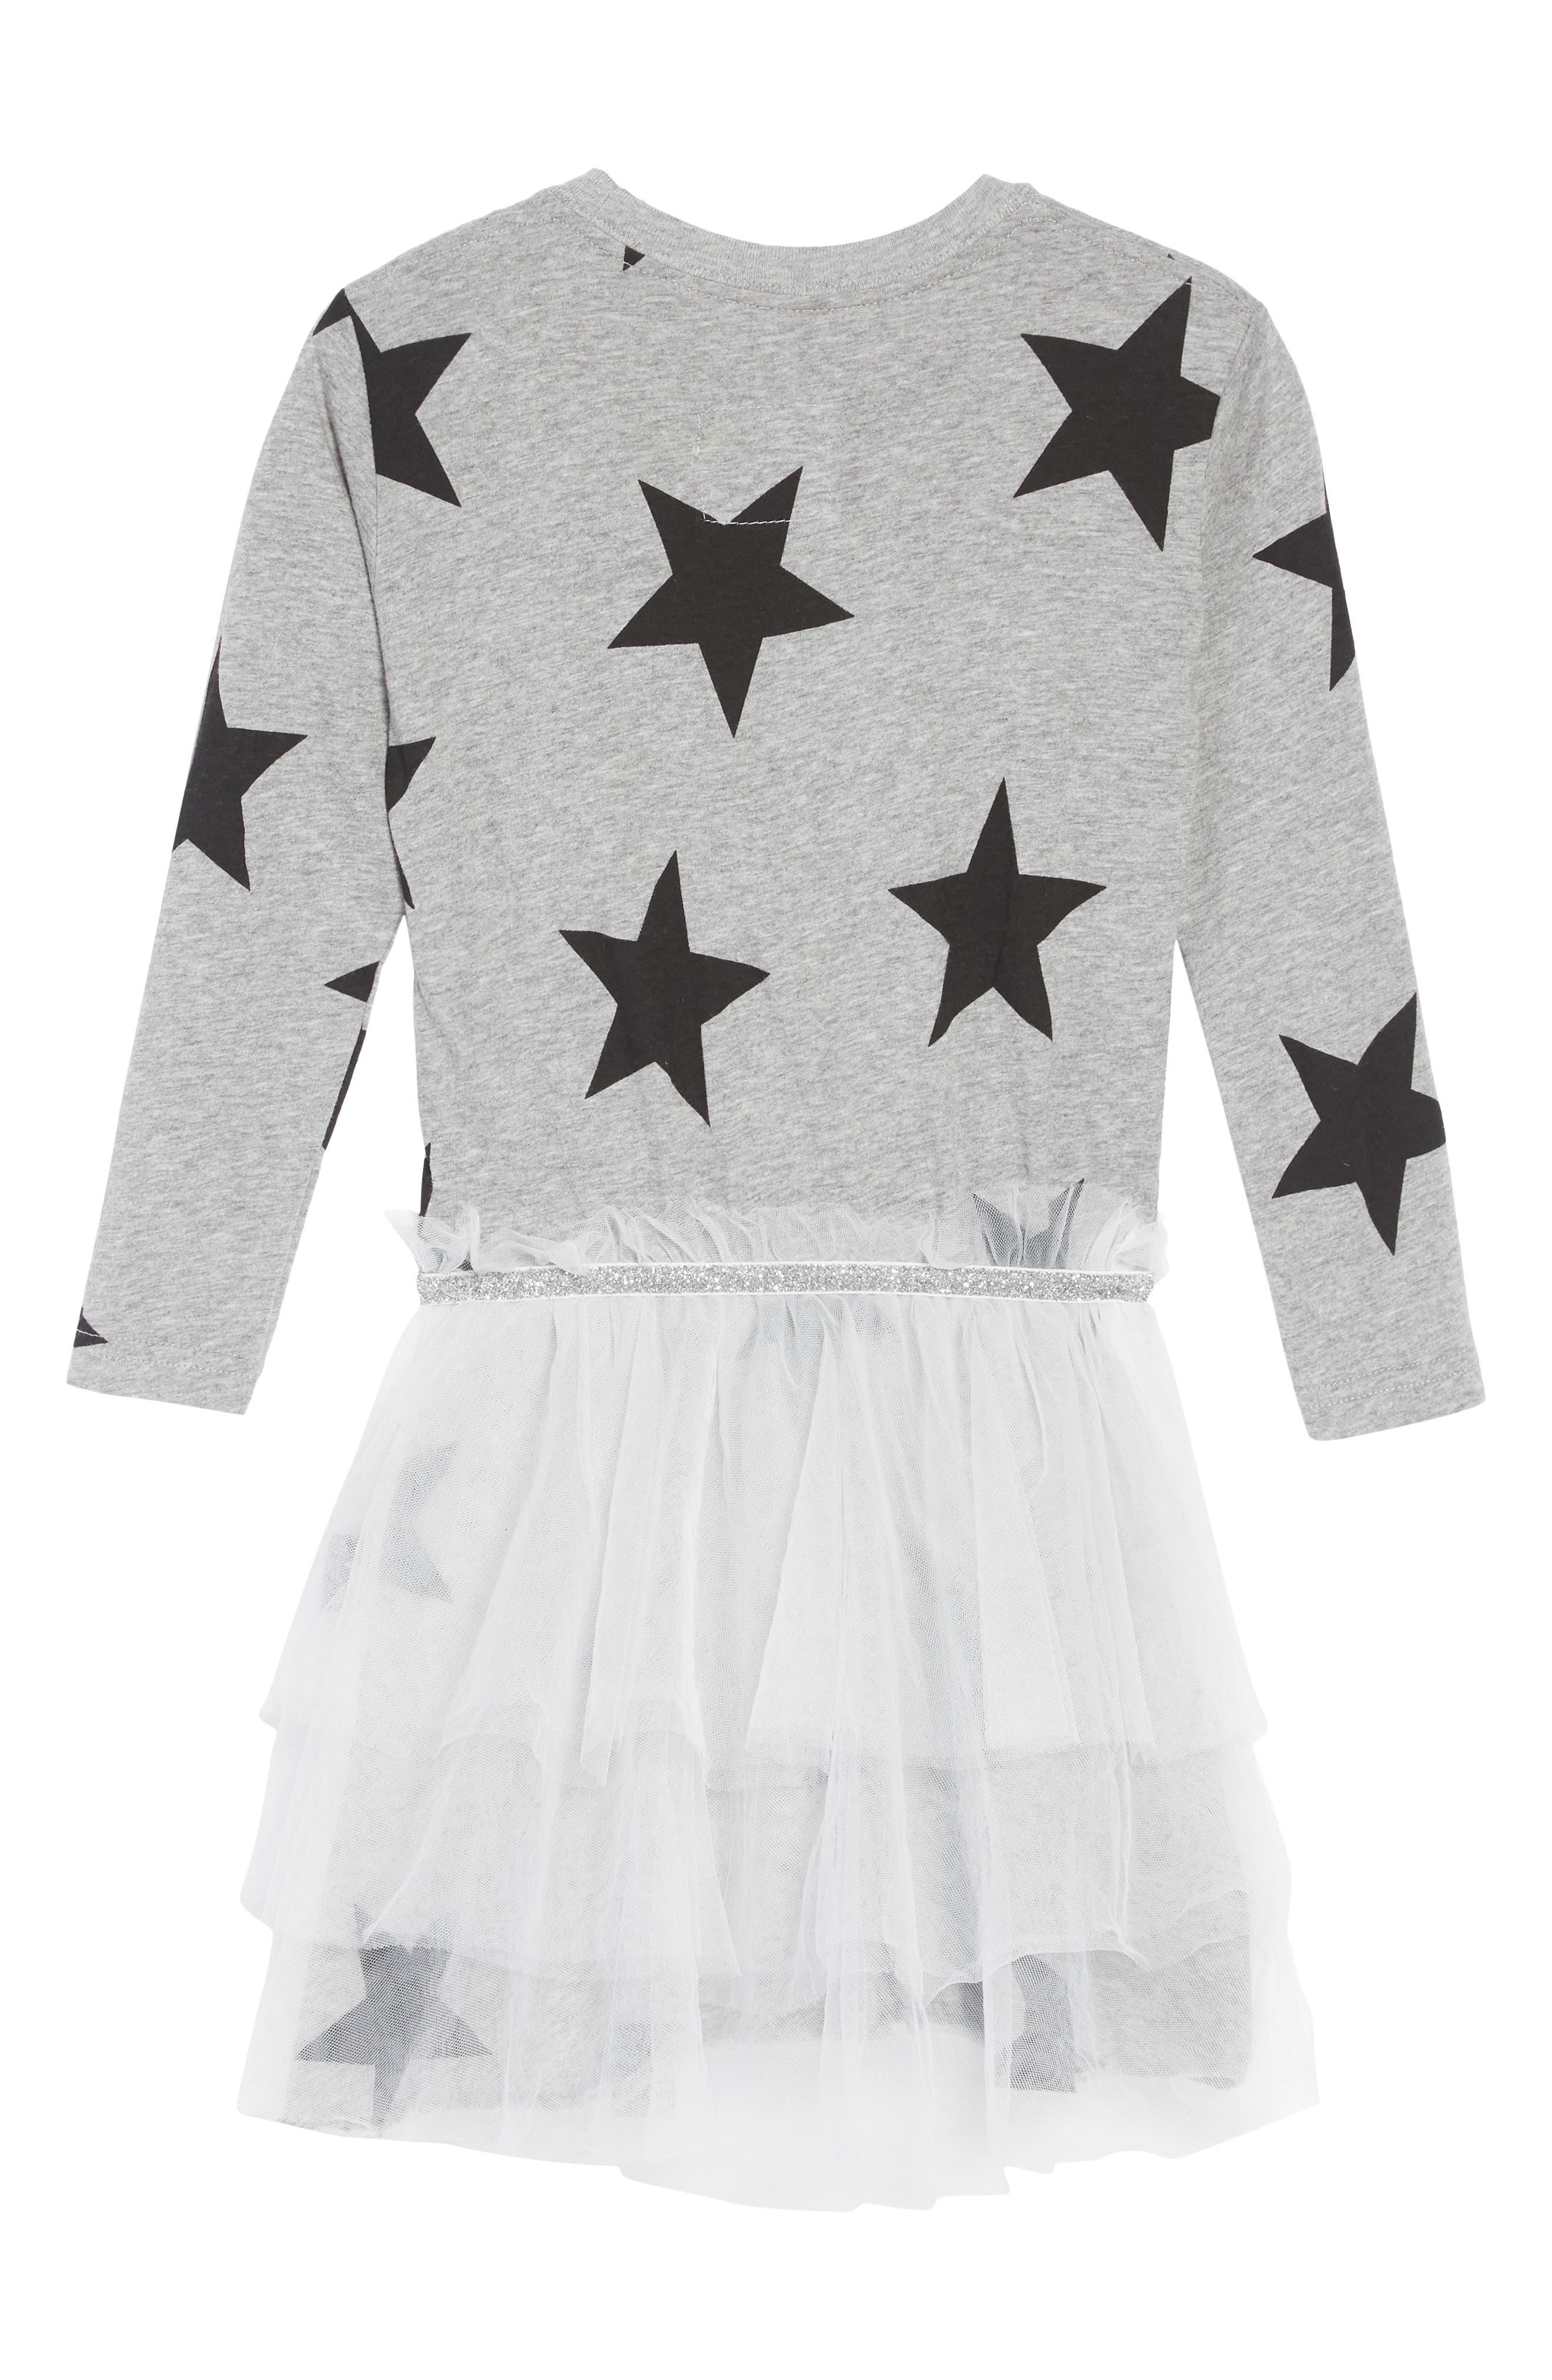 Star Tulle Dress,                             Alternate thumbnail 2, color,                             HEATHER GREY